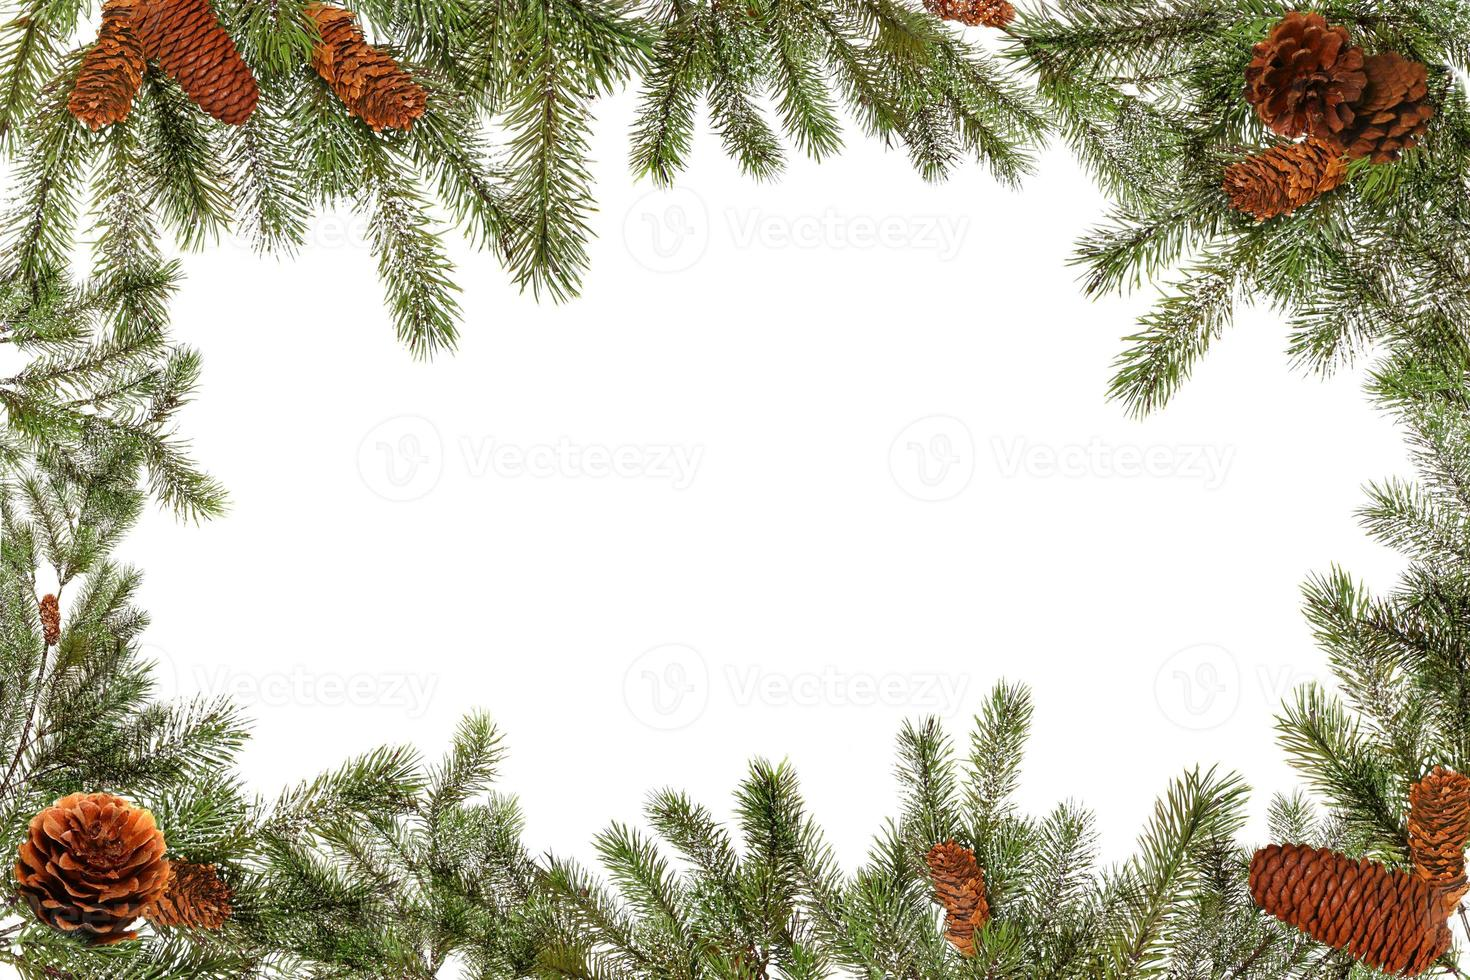 groene boomtakken en dennenappels op een witte achtergrond foto